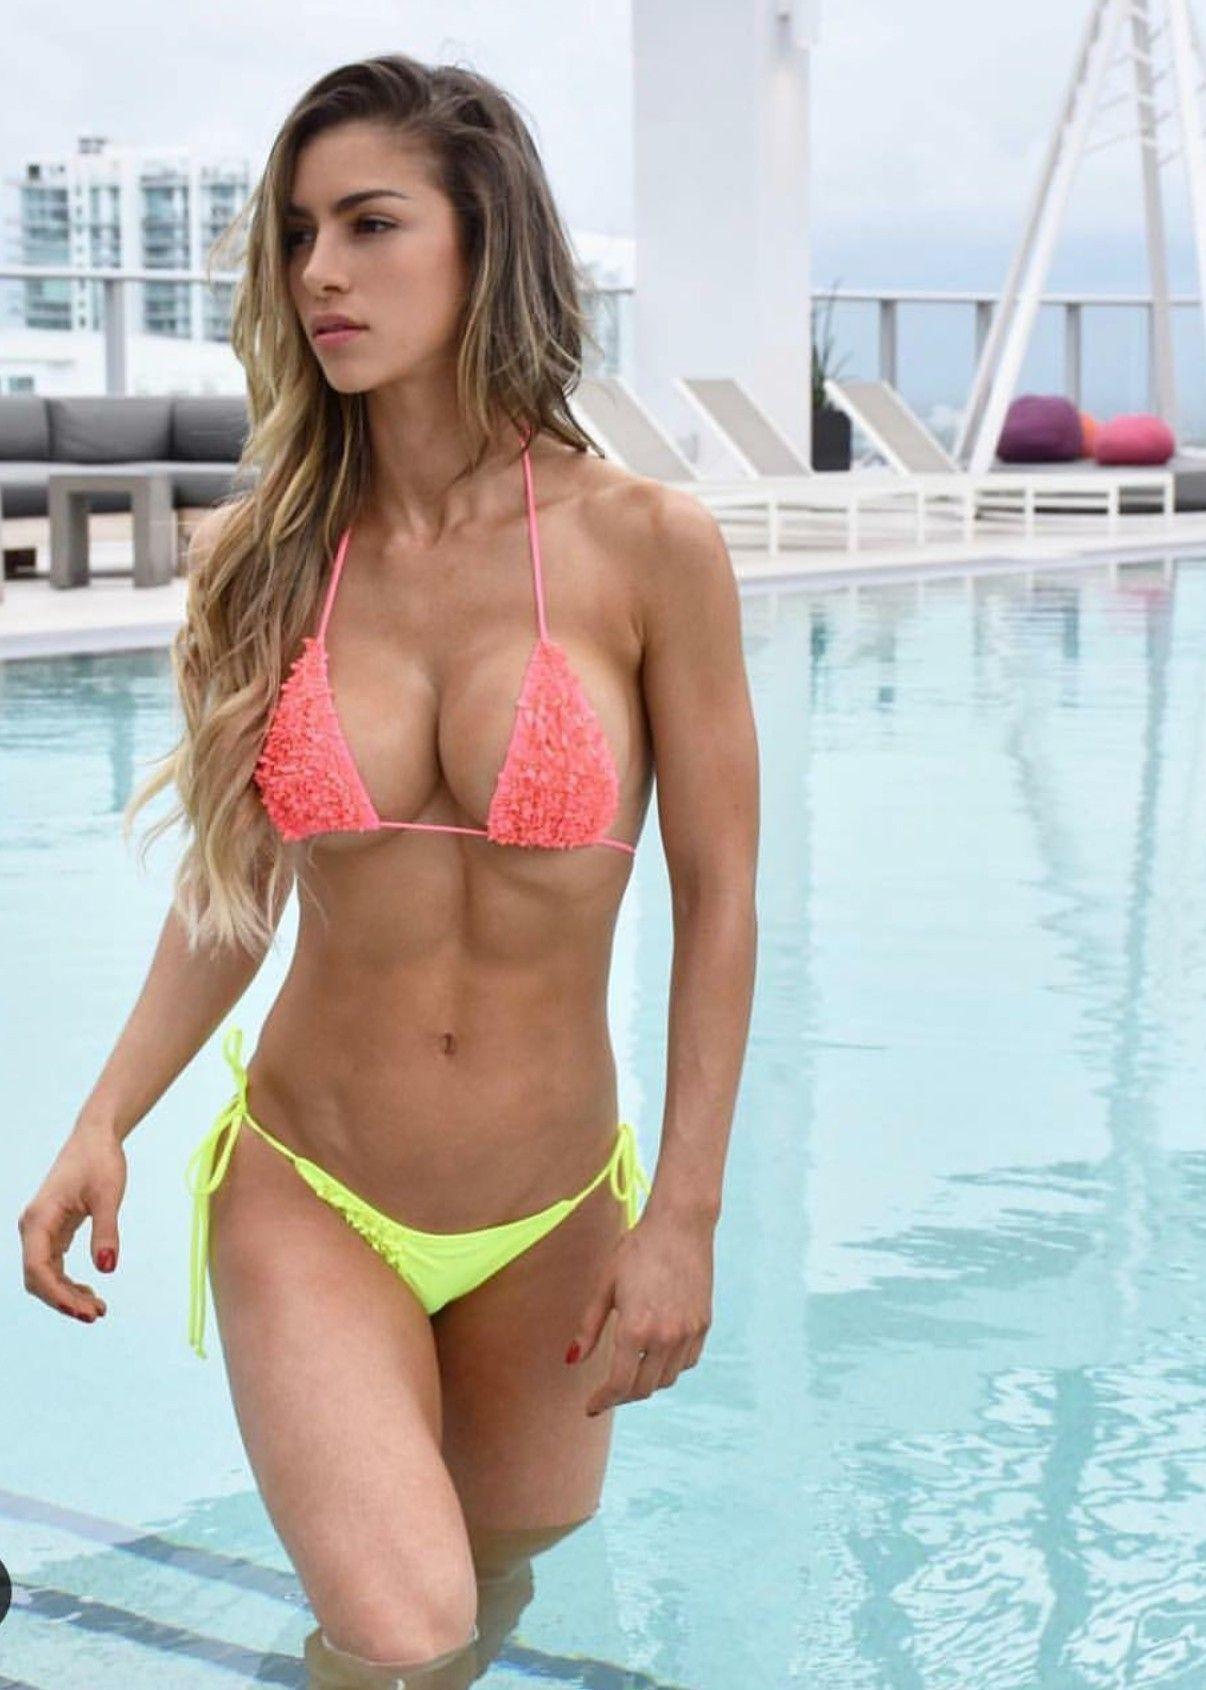 Sunny 2519 купальник женский Women Fashion Push-up Padded Bra Beach Bikini Set Swimsuit Beachwear Swimwear 25 Swimming